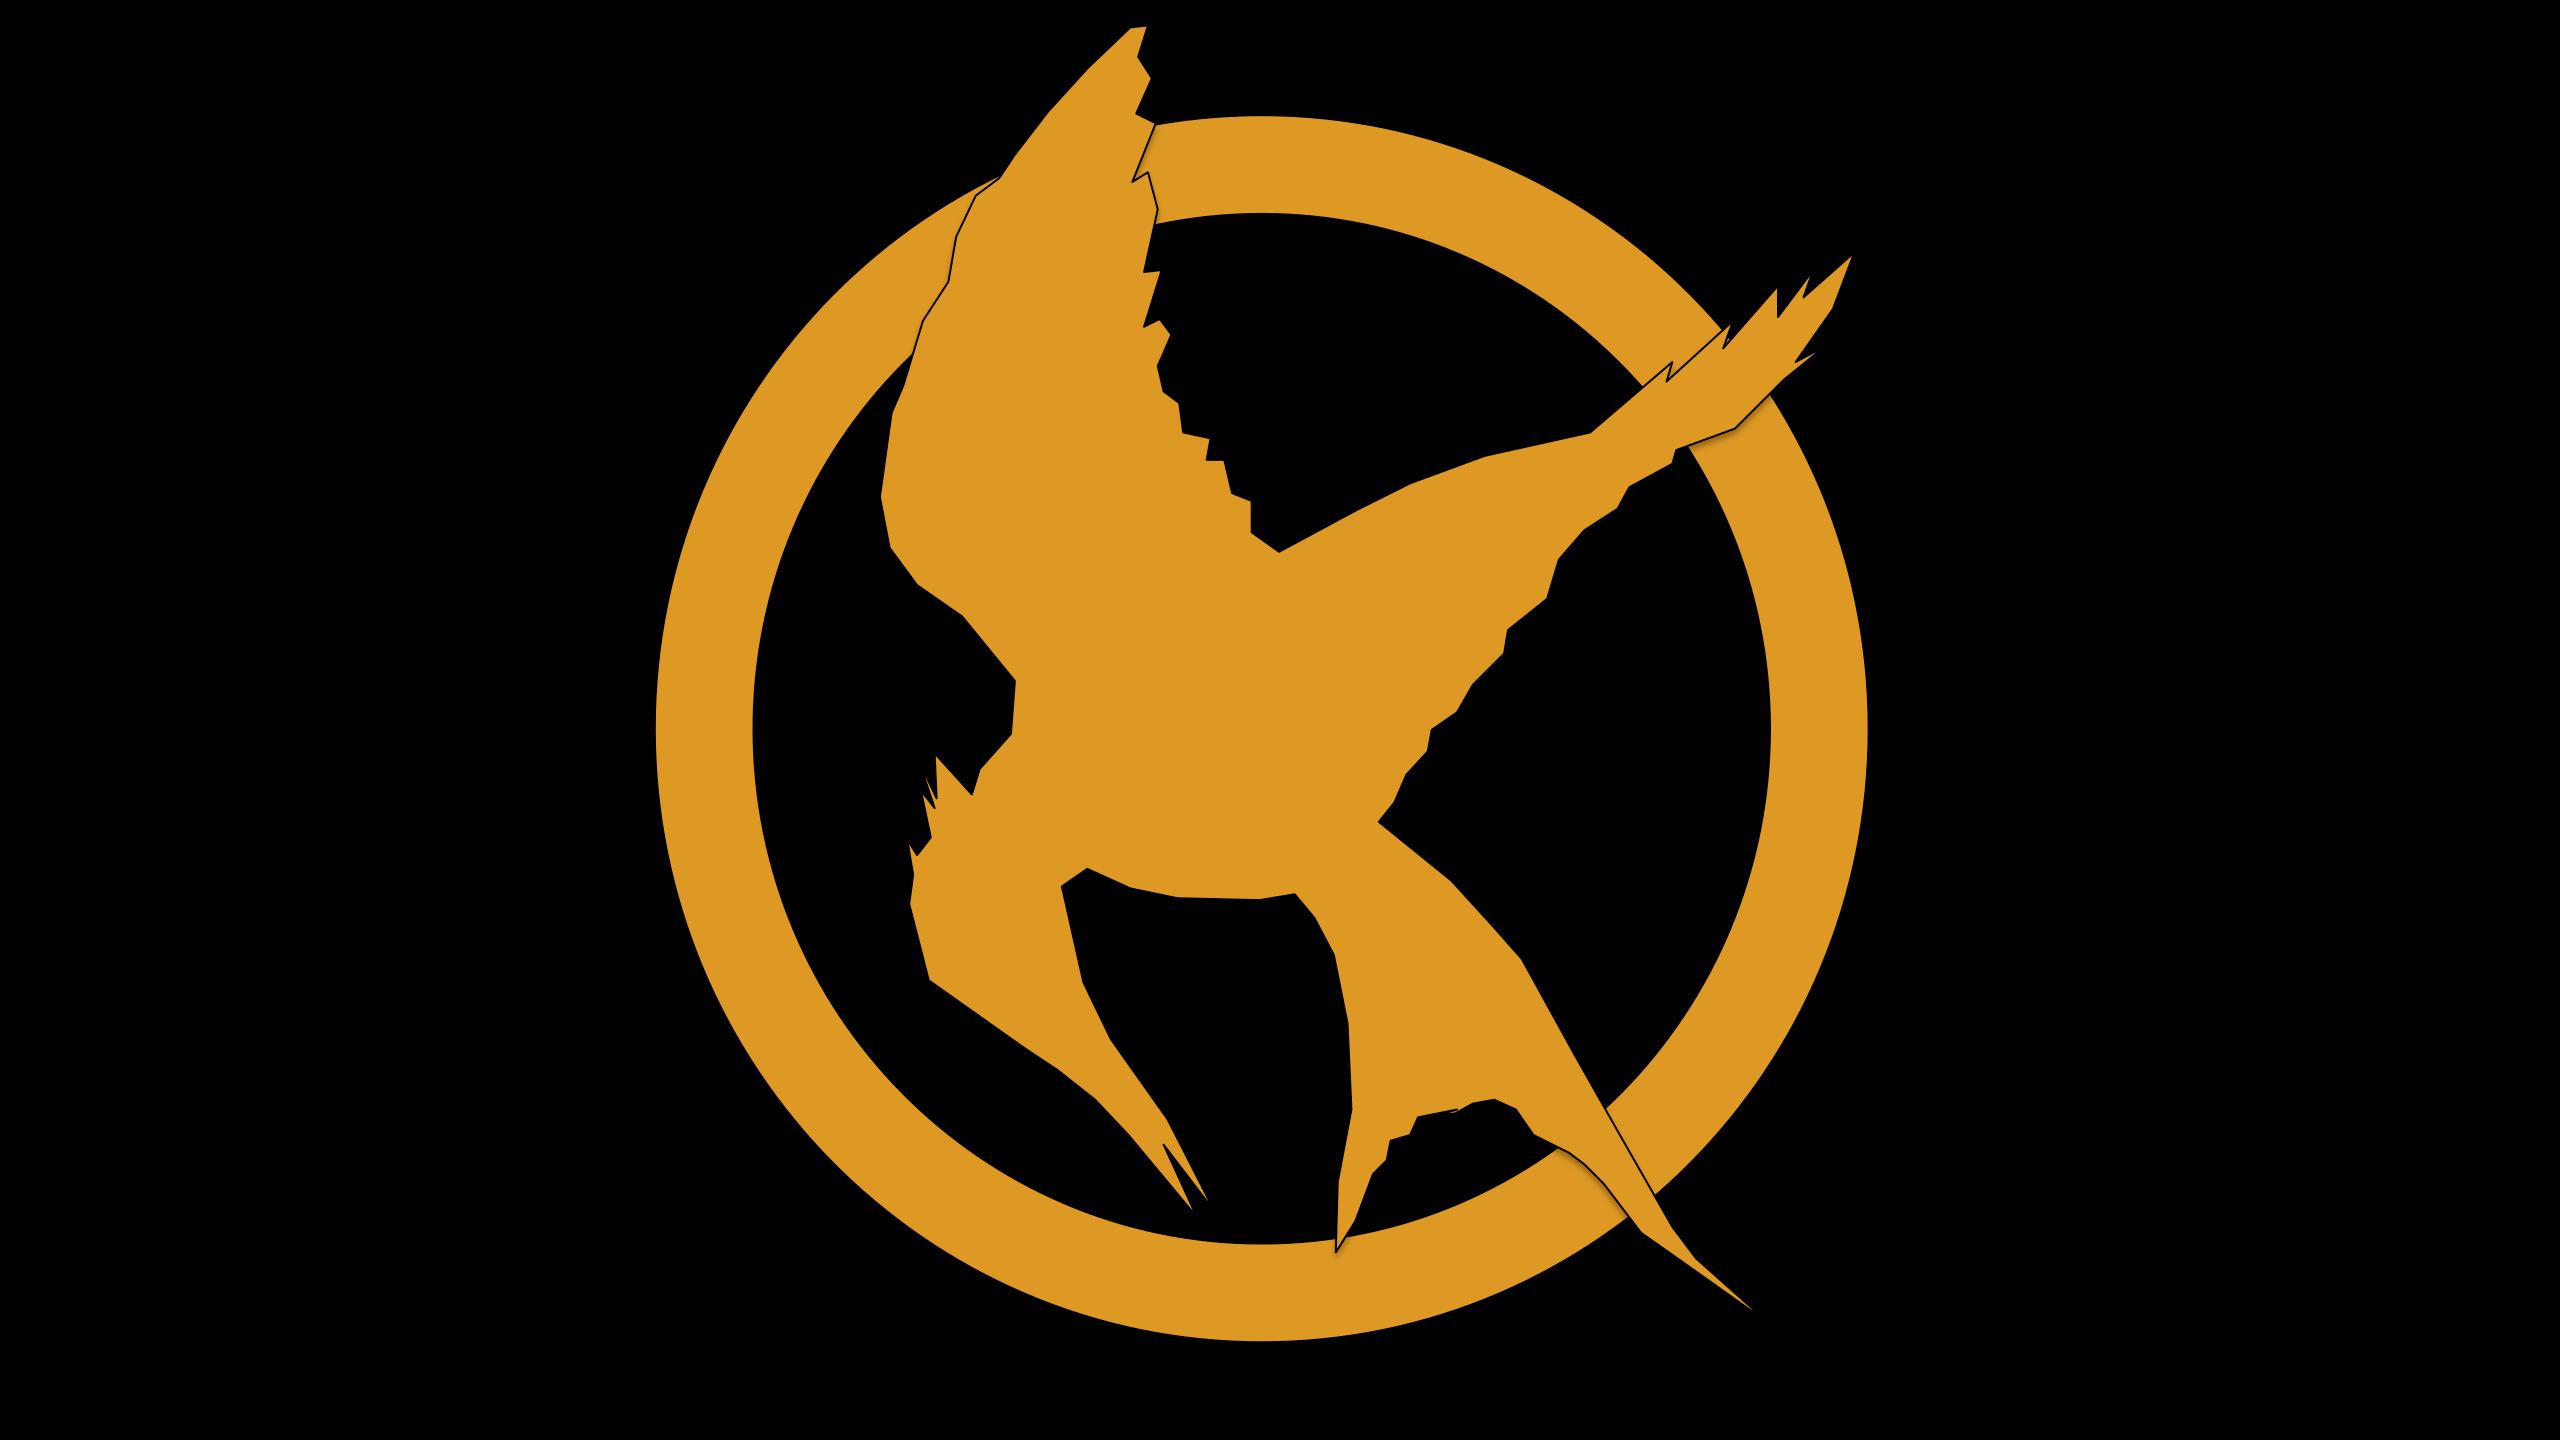 Hunger Games La  Official Logo Big.png - The Hunger Games, Transparent background PNG HD thumbnail